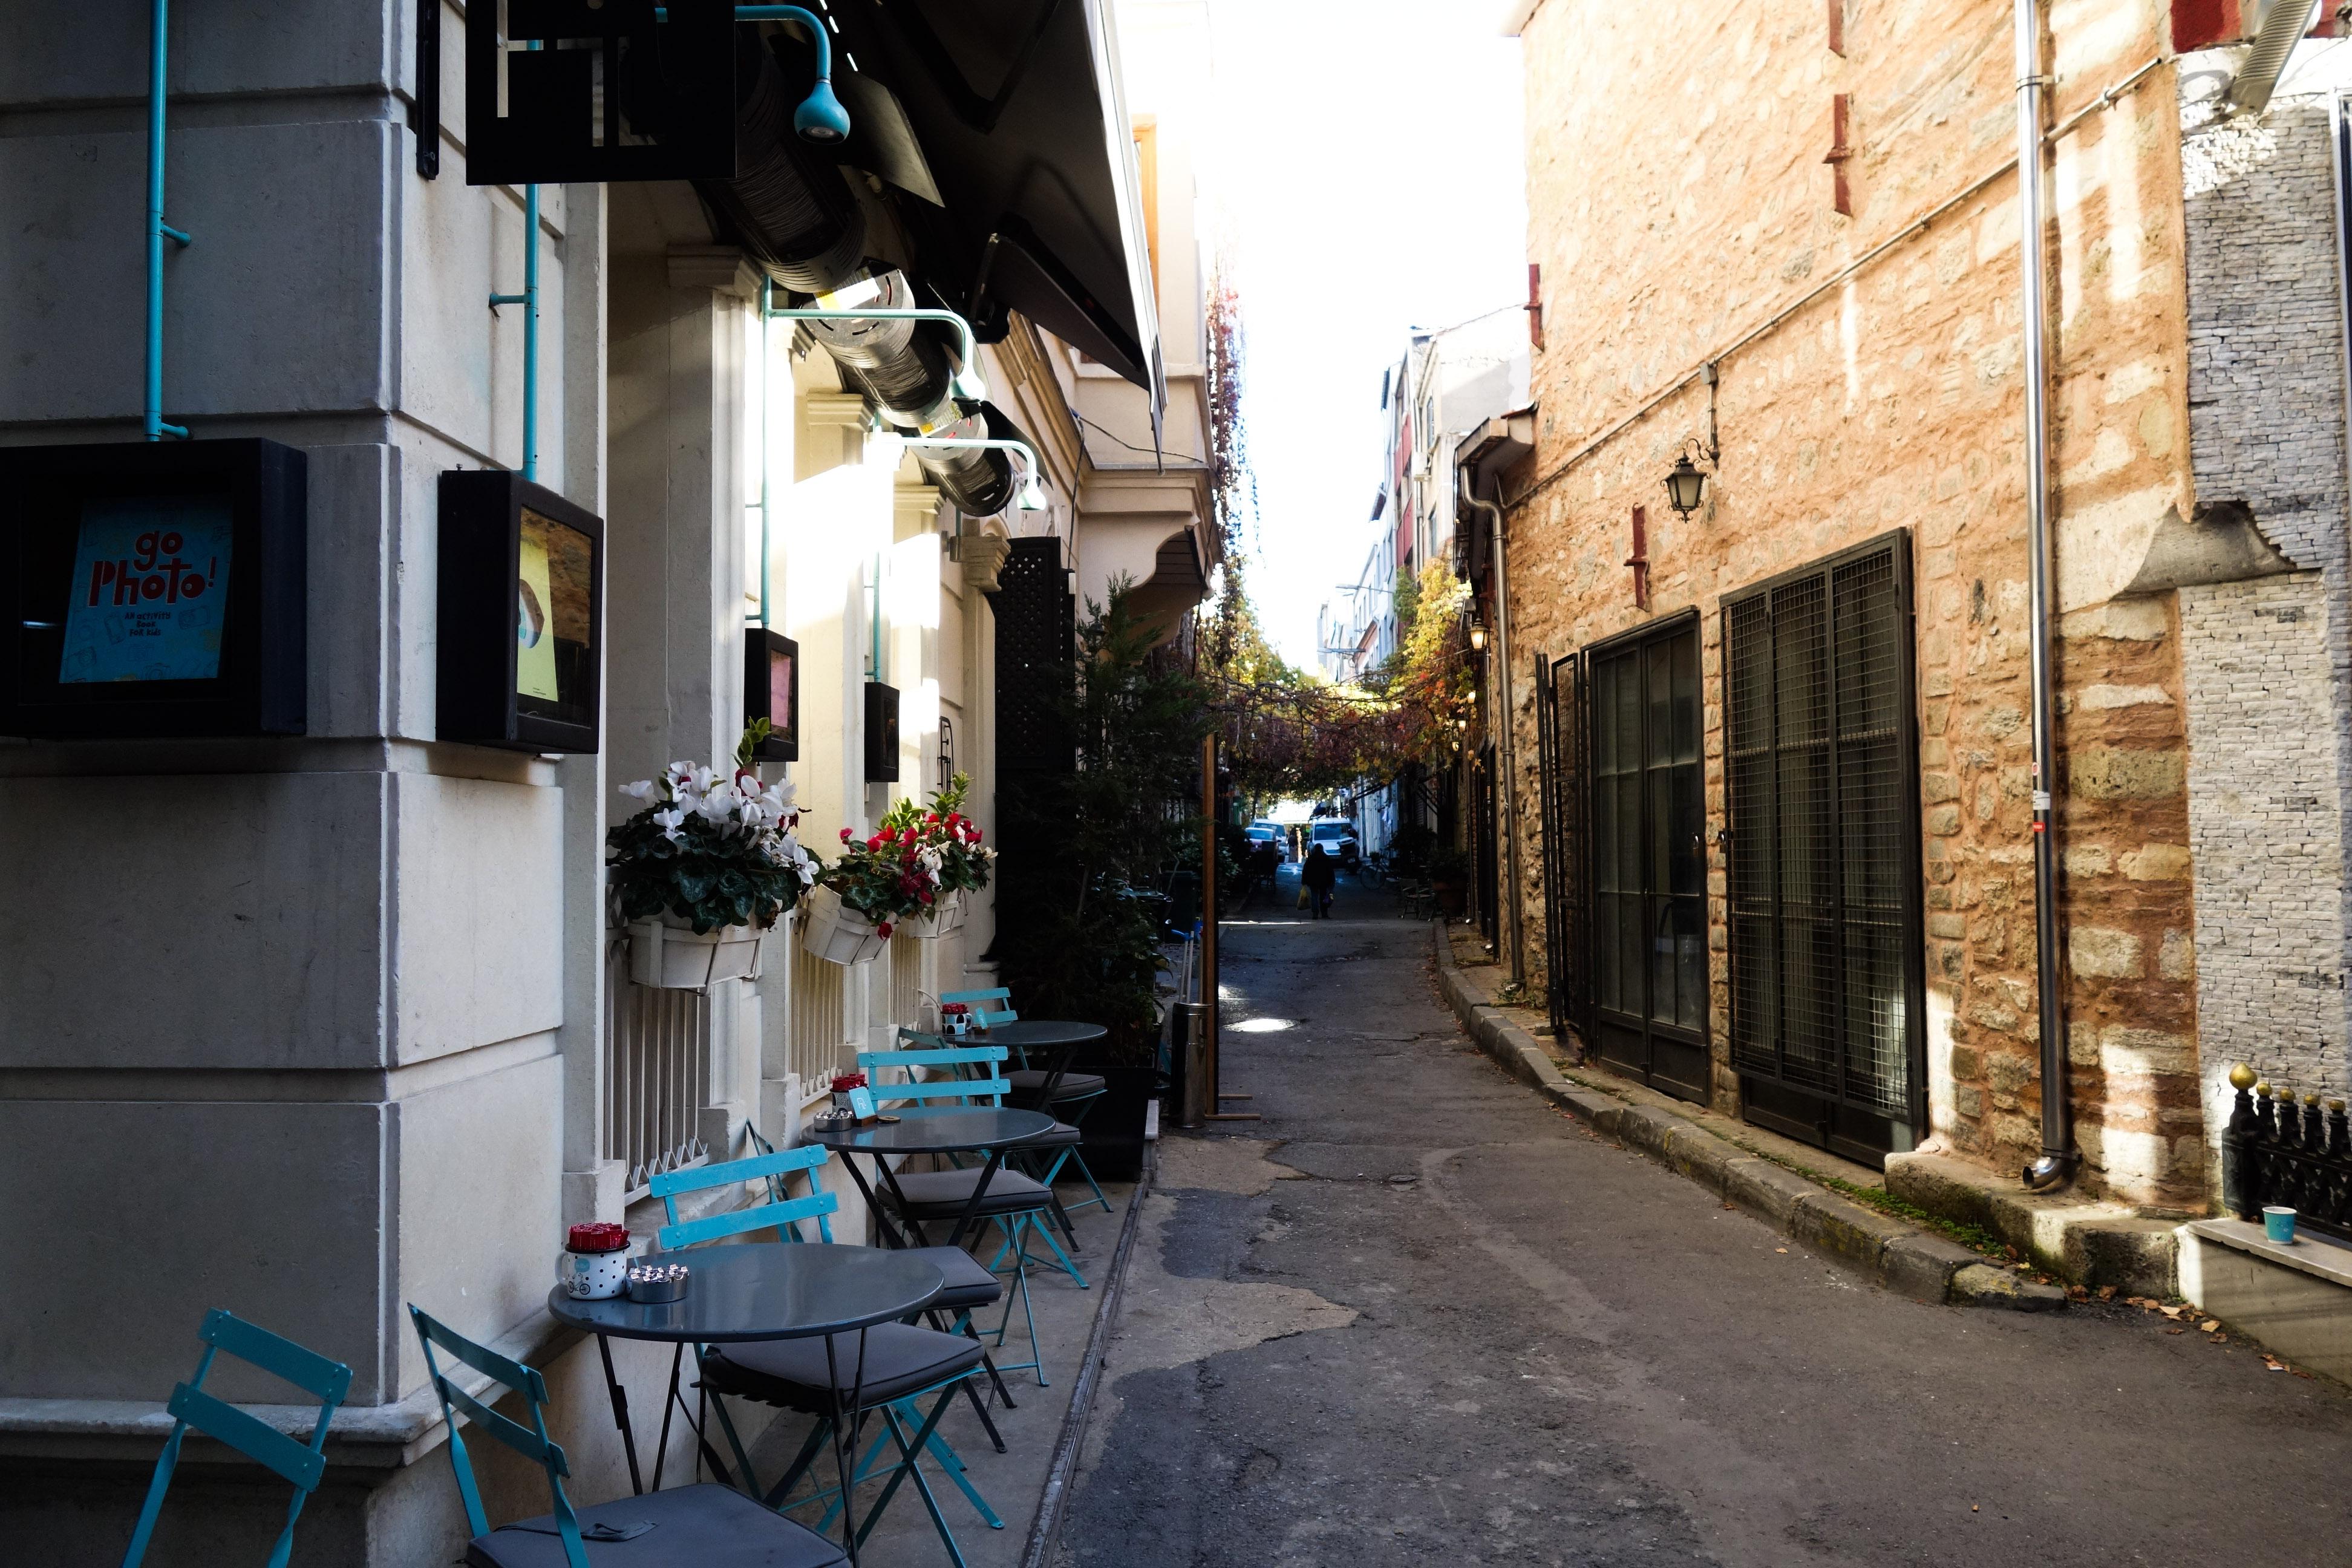 Le stradine ricche di ristorantini e caffè a Karaköy